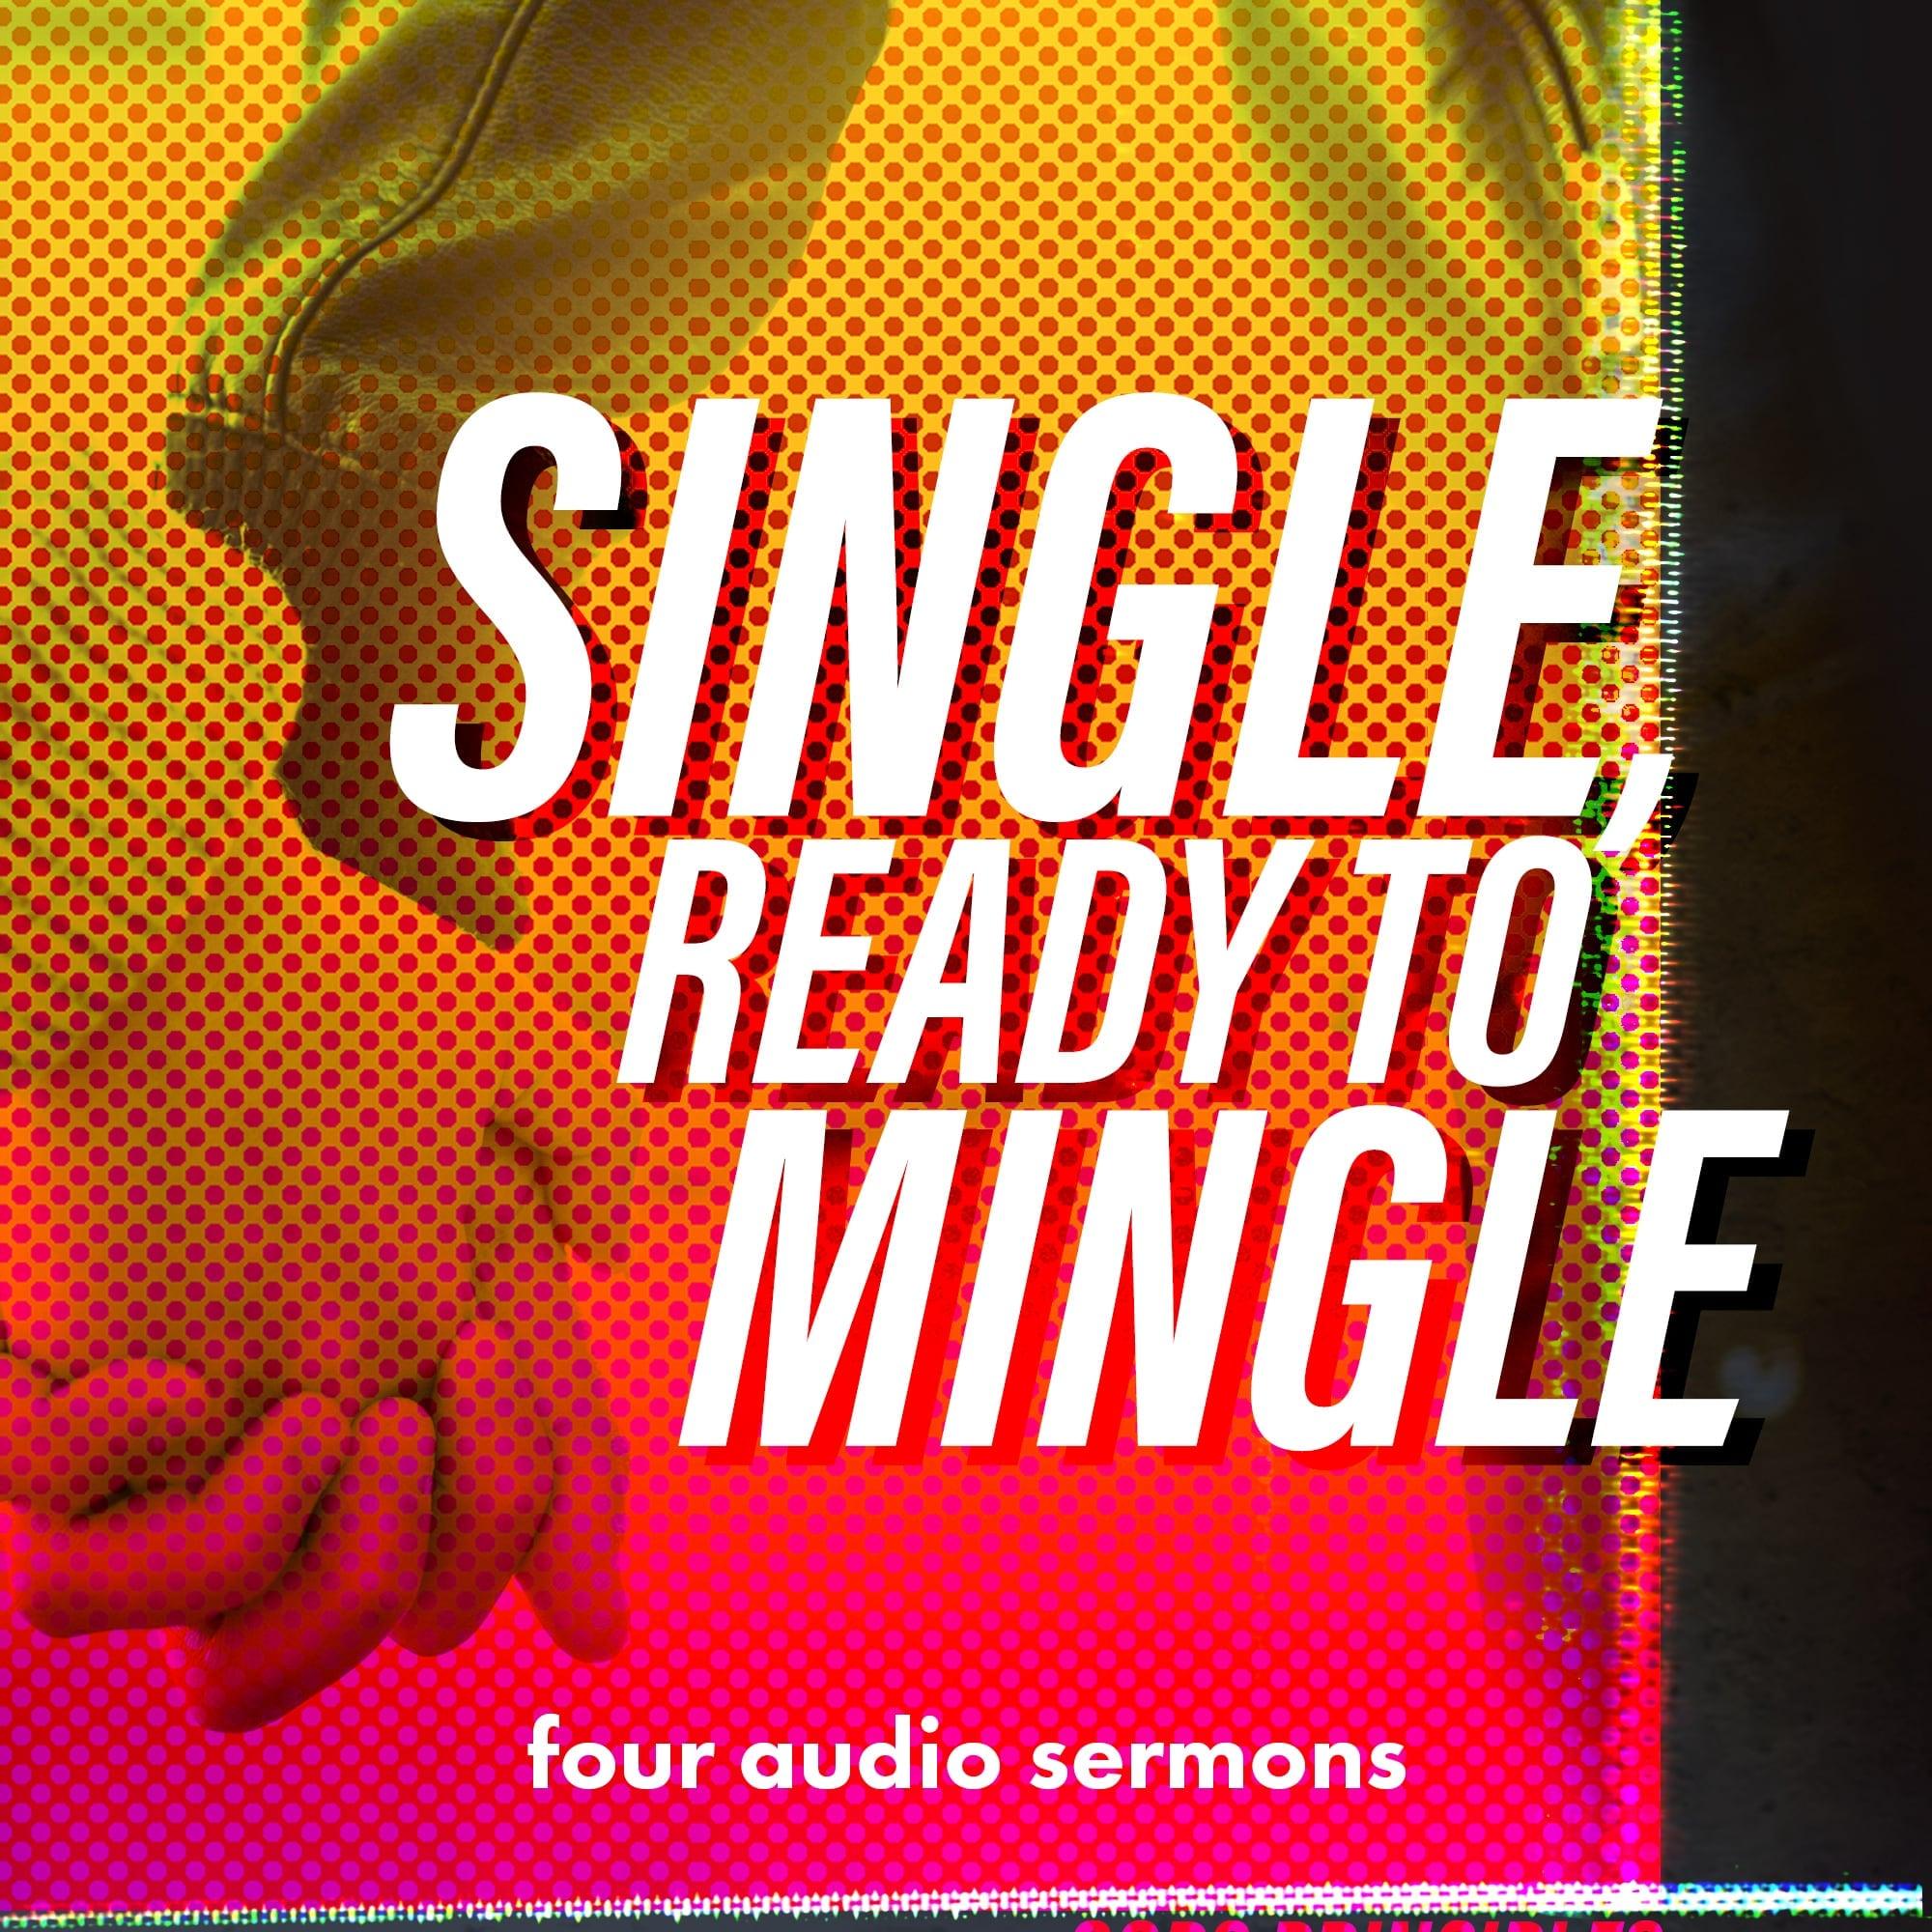 Series: Single, Ready to Mingle